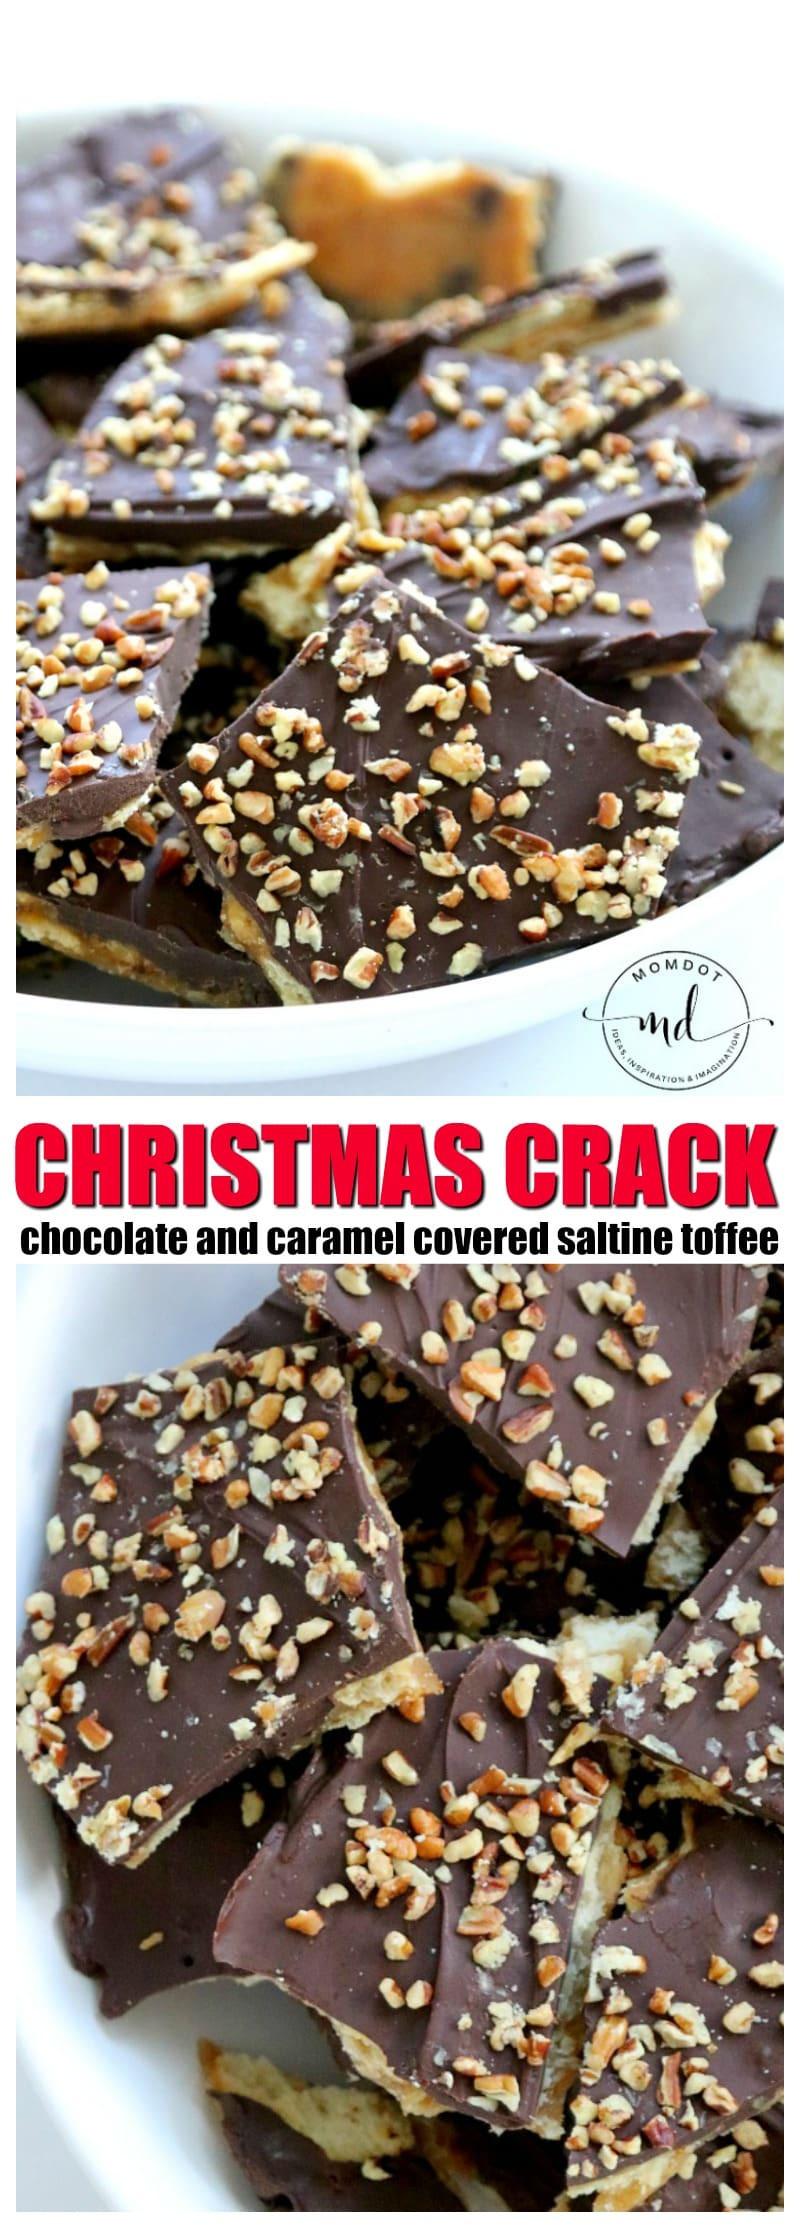 Christmas Crack Recipe With Ritz Crackers  Christmas Crack Ritz Cracker Toffee MomDot howlDb